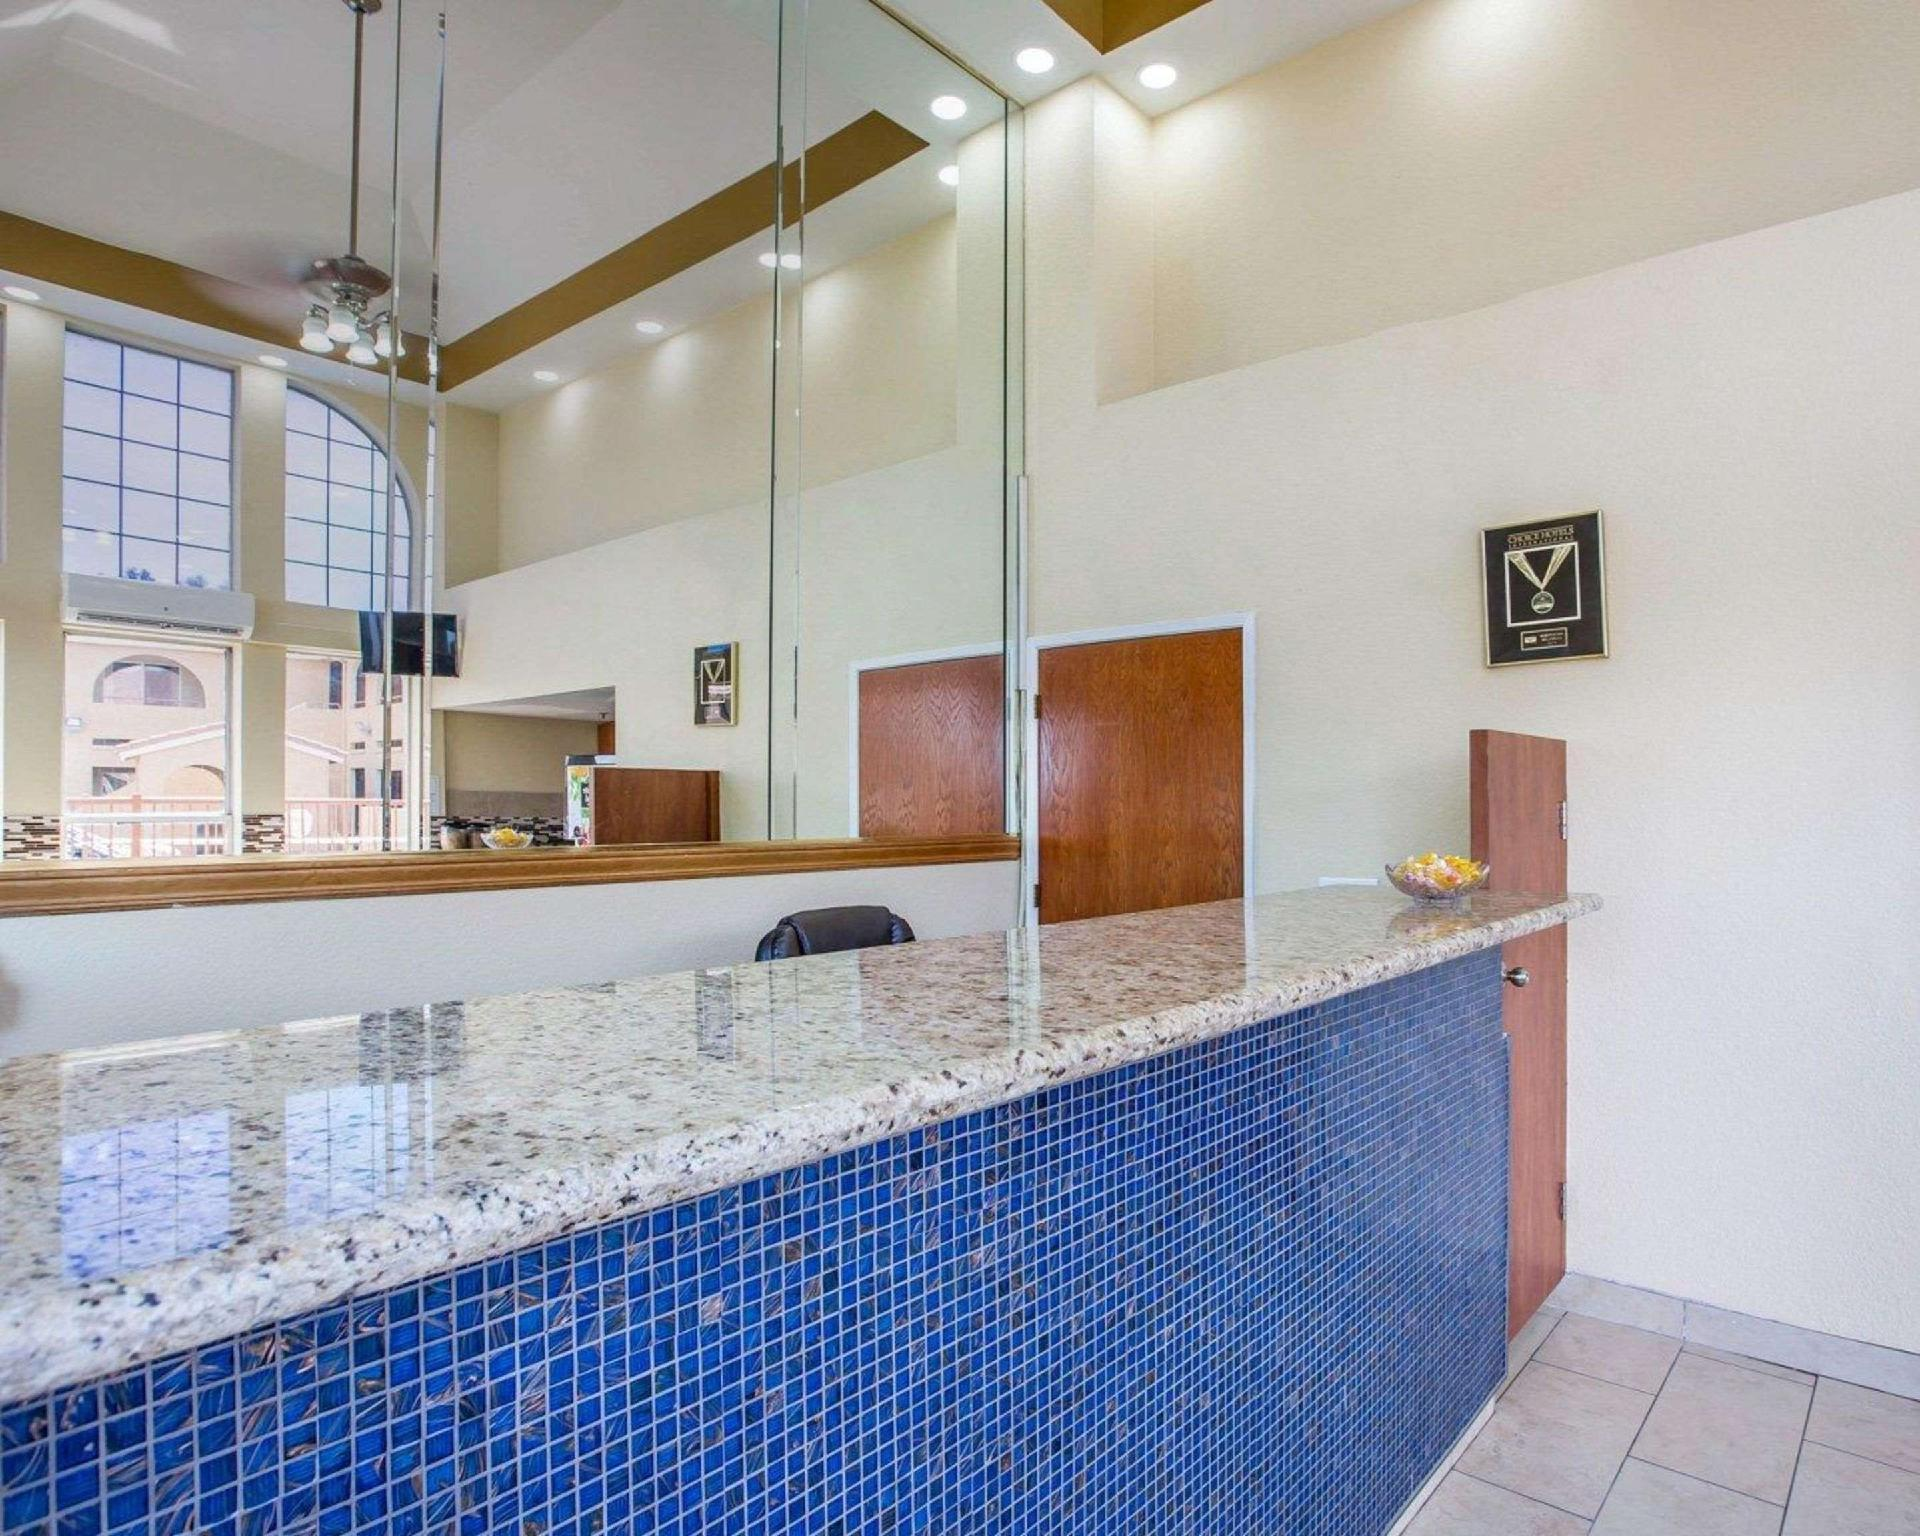 Rodeway Inn Delano Delano Ca Room Rates Photos Reviews